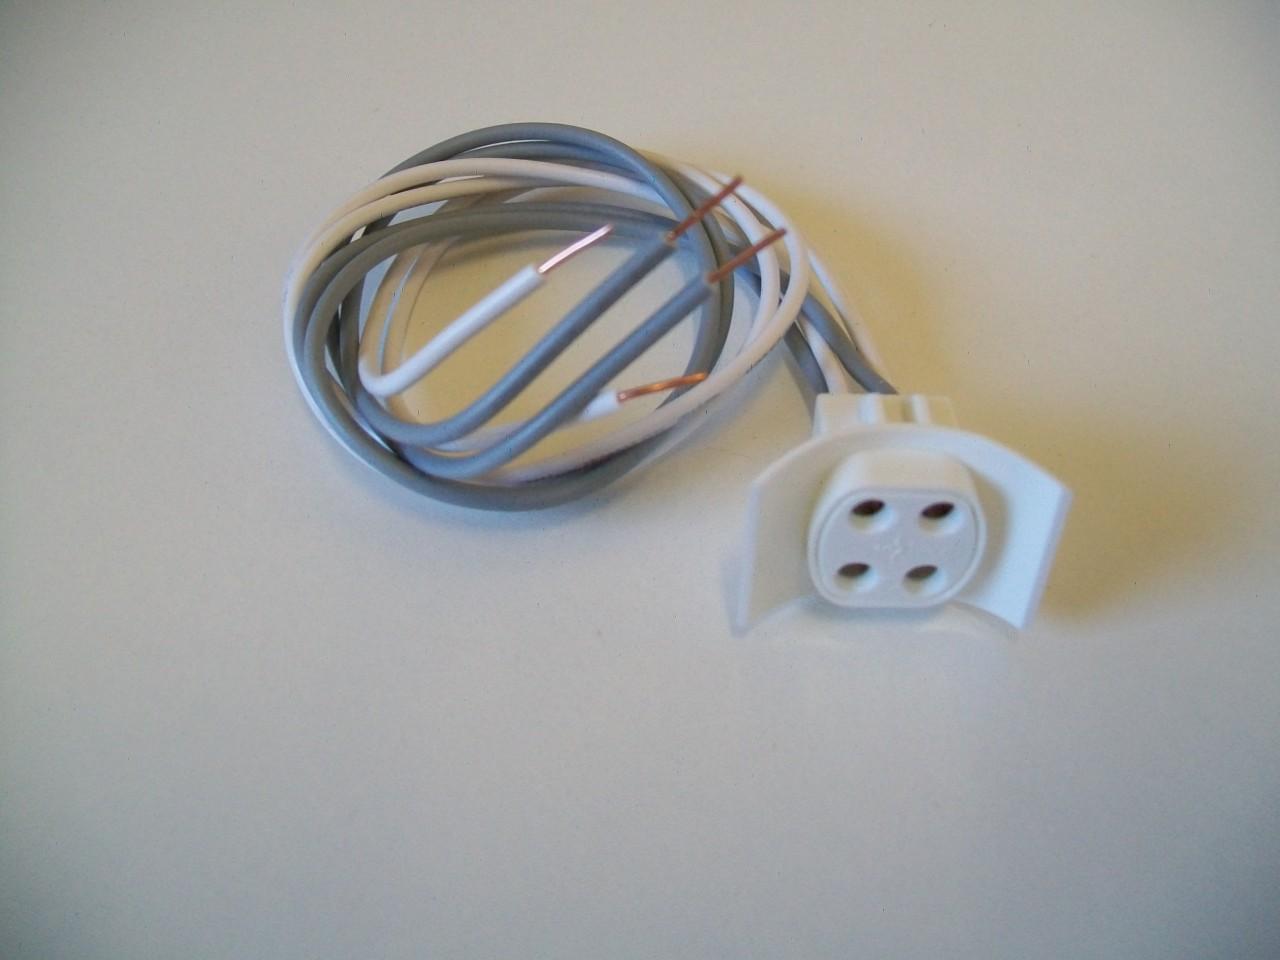 clarence water filters australia uv water steriliser. Black Bedroom Furniture Sets. Home Design Ideas